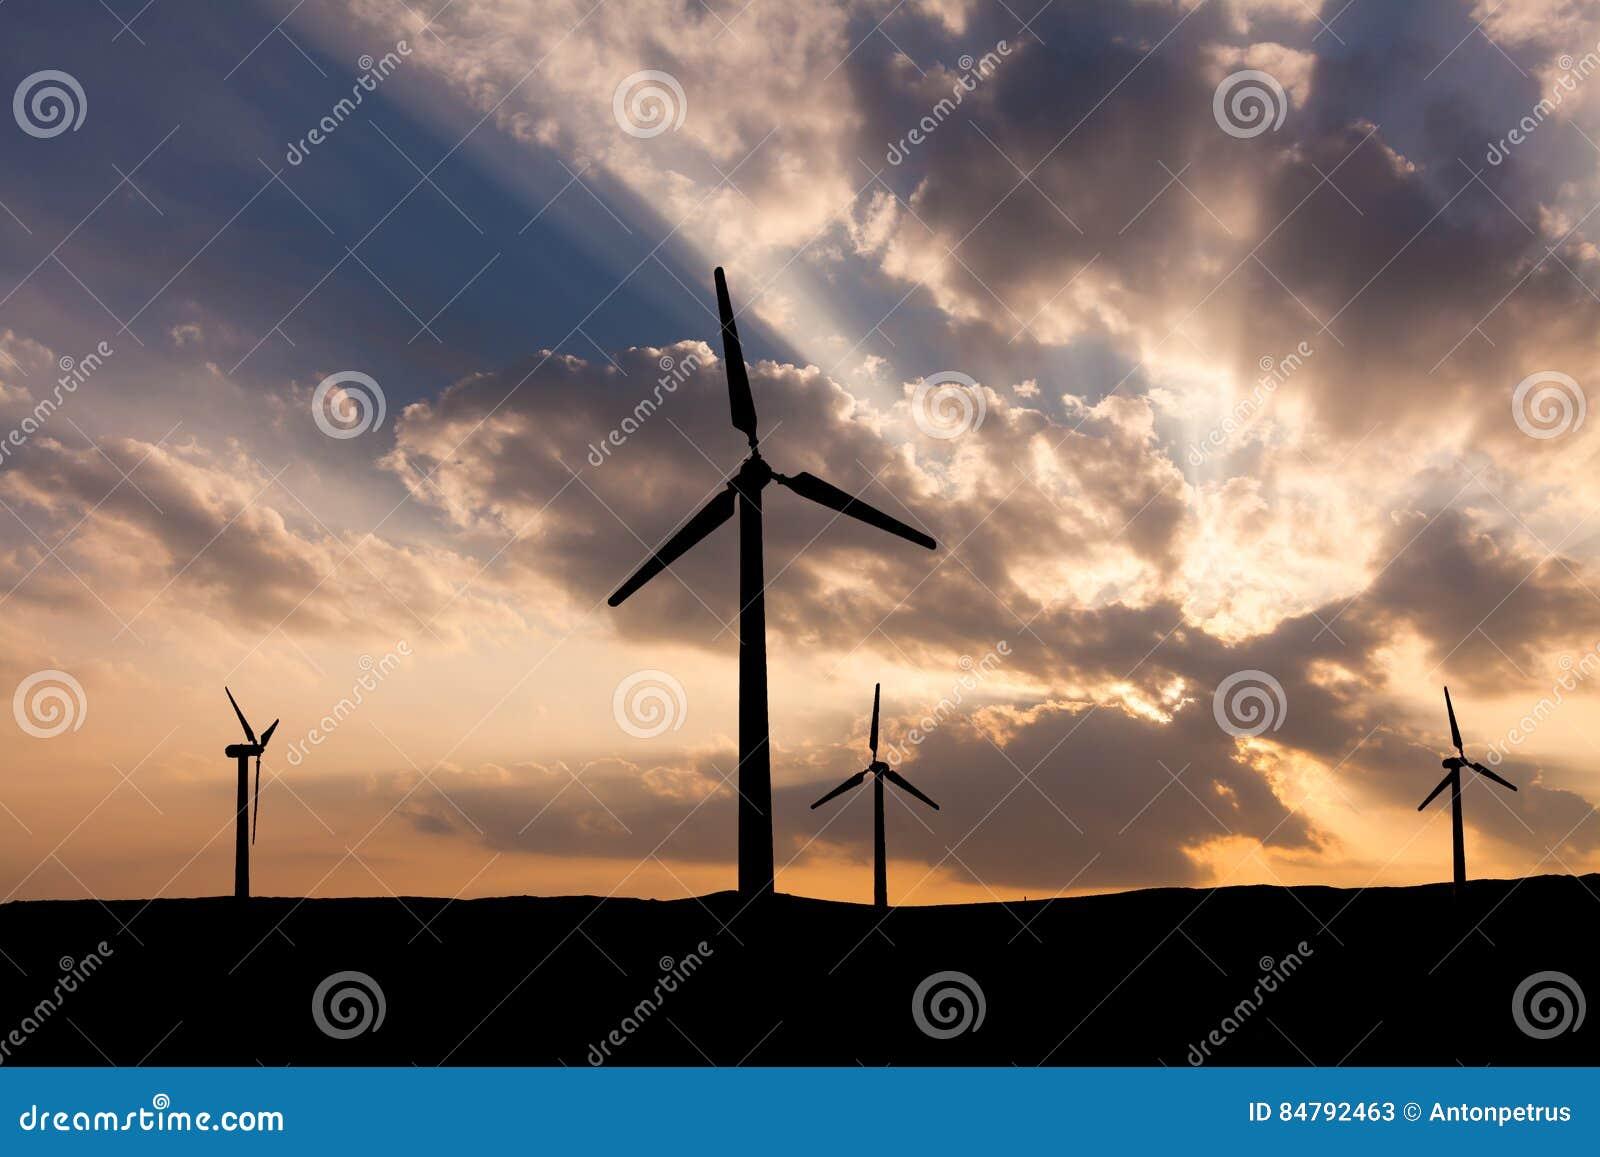 Wind turbines on the sunset sky background